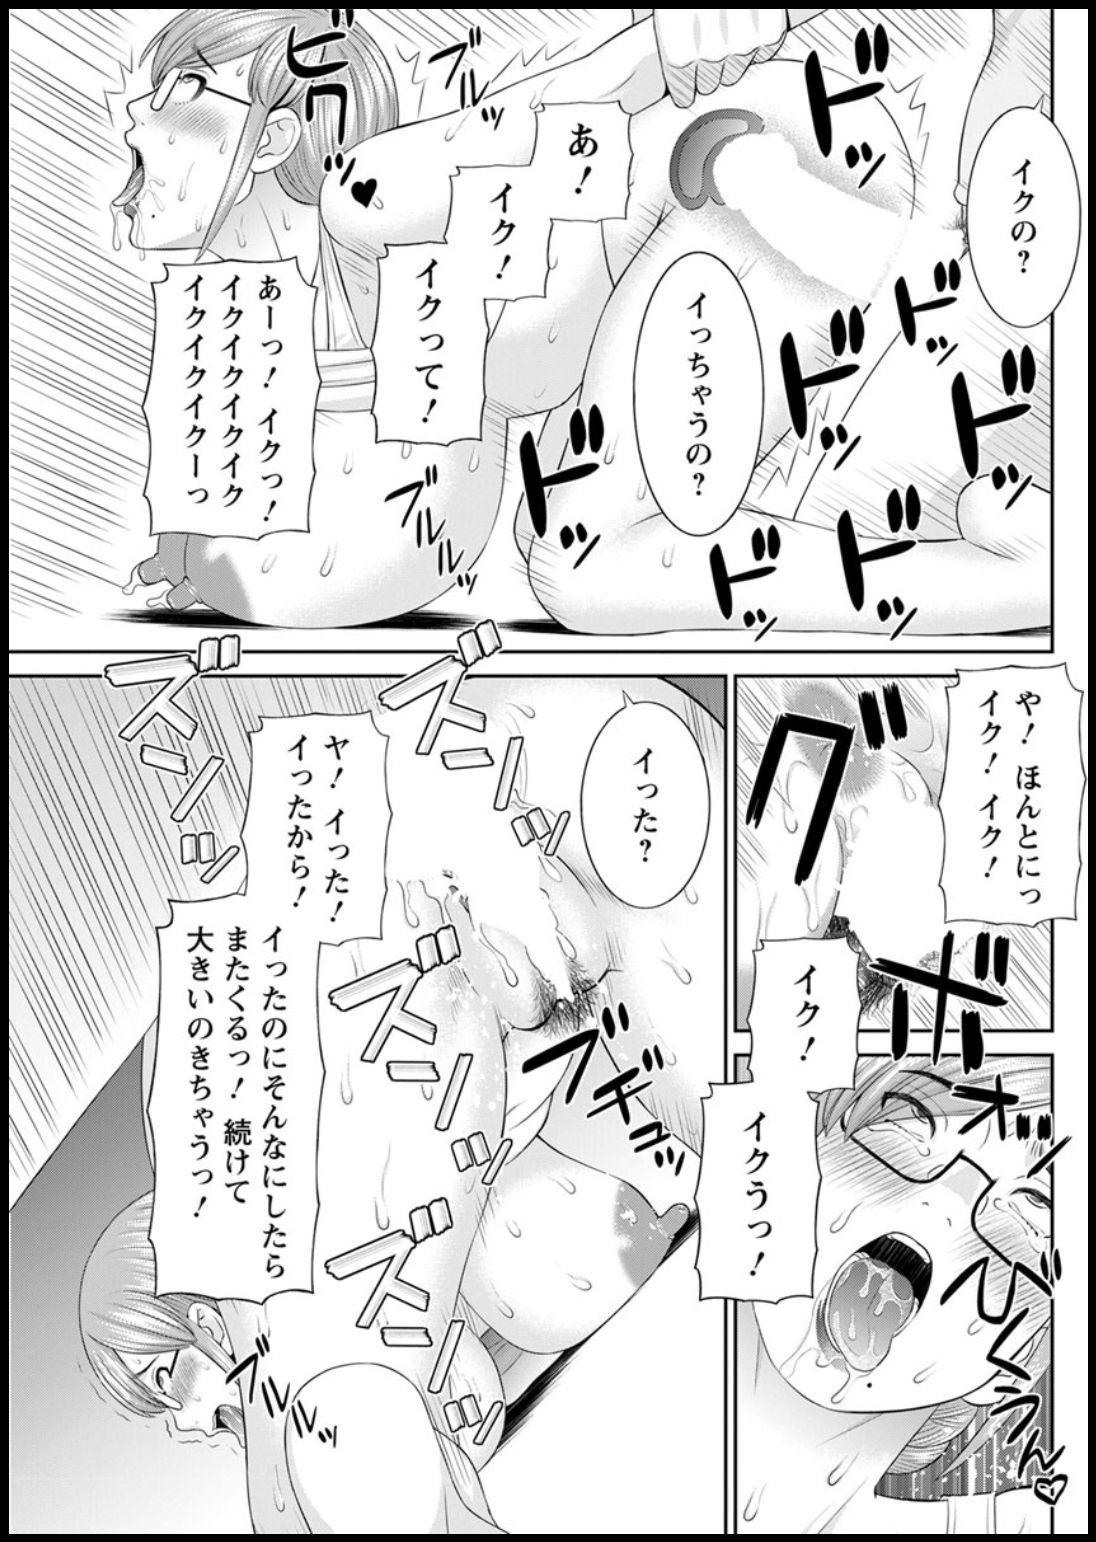 [Kawamori Misaki] Kaikan Hitotsuma Gakuen Ch. 1-6, 8-16 [Digital] 160